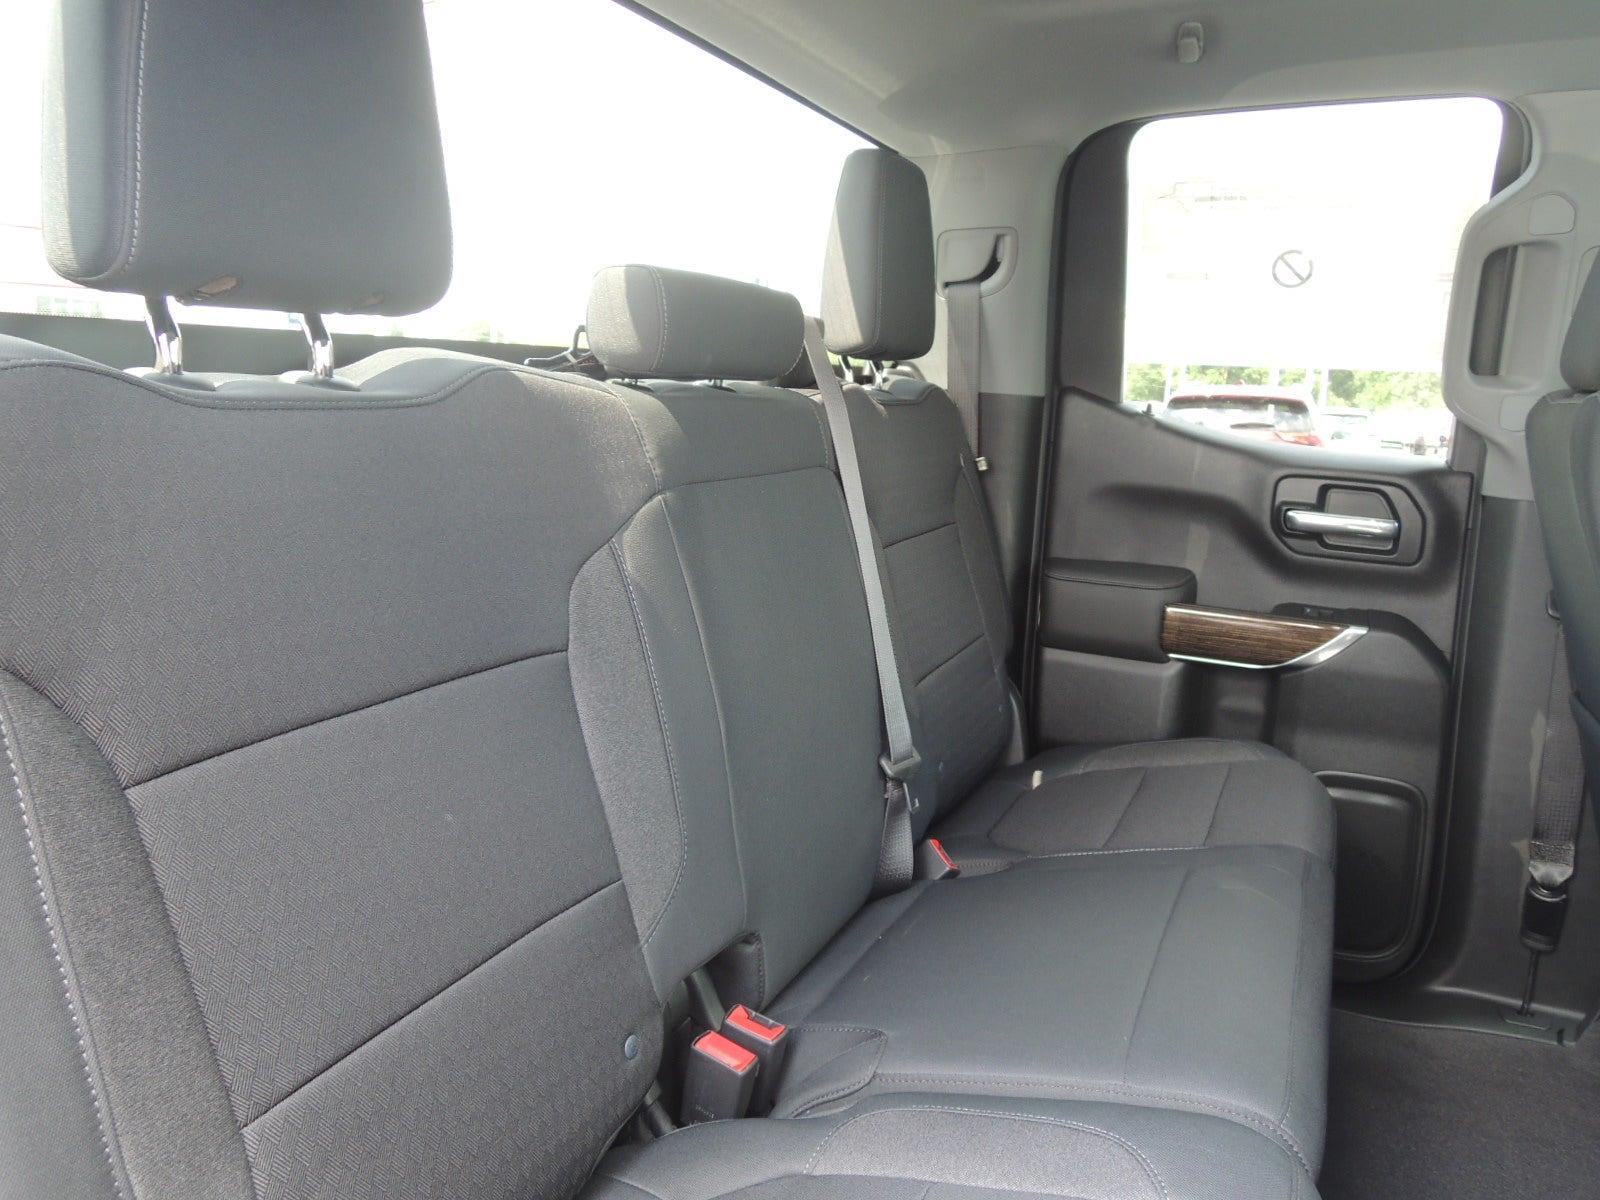 2021 GMC Sierra 1500 Double Cab 4x2, Pickup #MT714 - photo 13